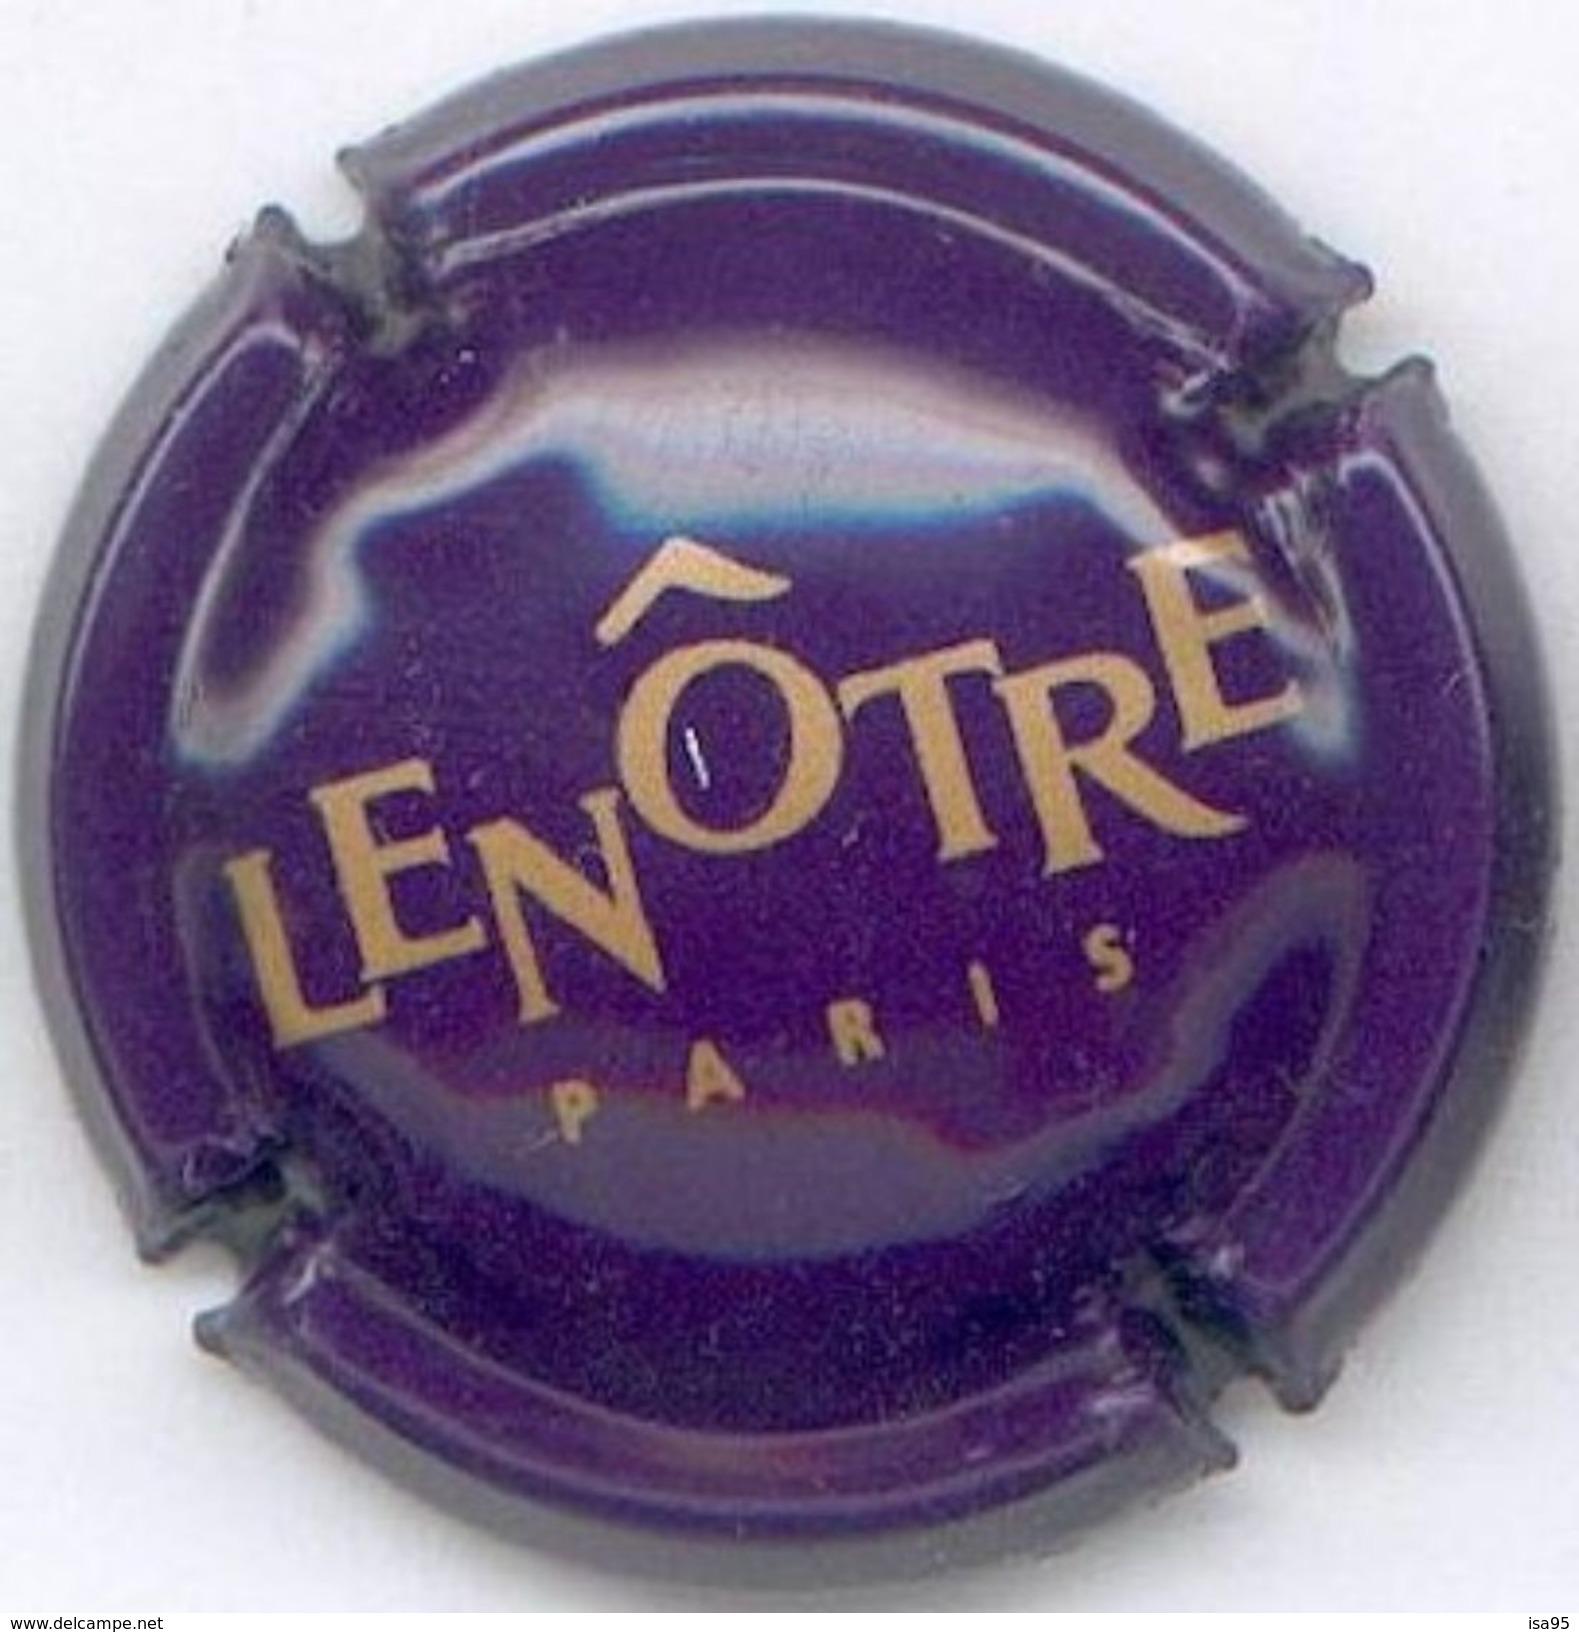 CAPSULE-CHAMPAGNE LENOTRE N°03 Violet Foncé & Or - Champagnerdeckel